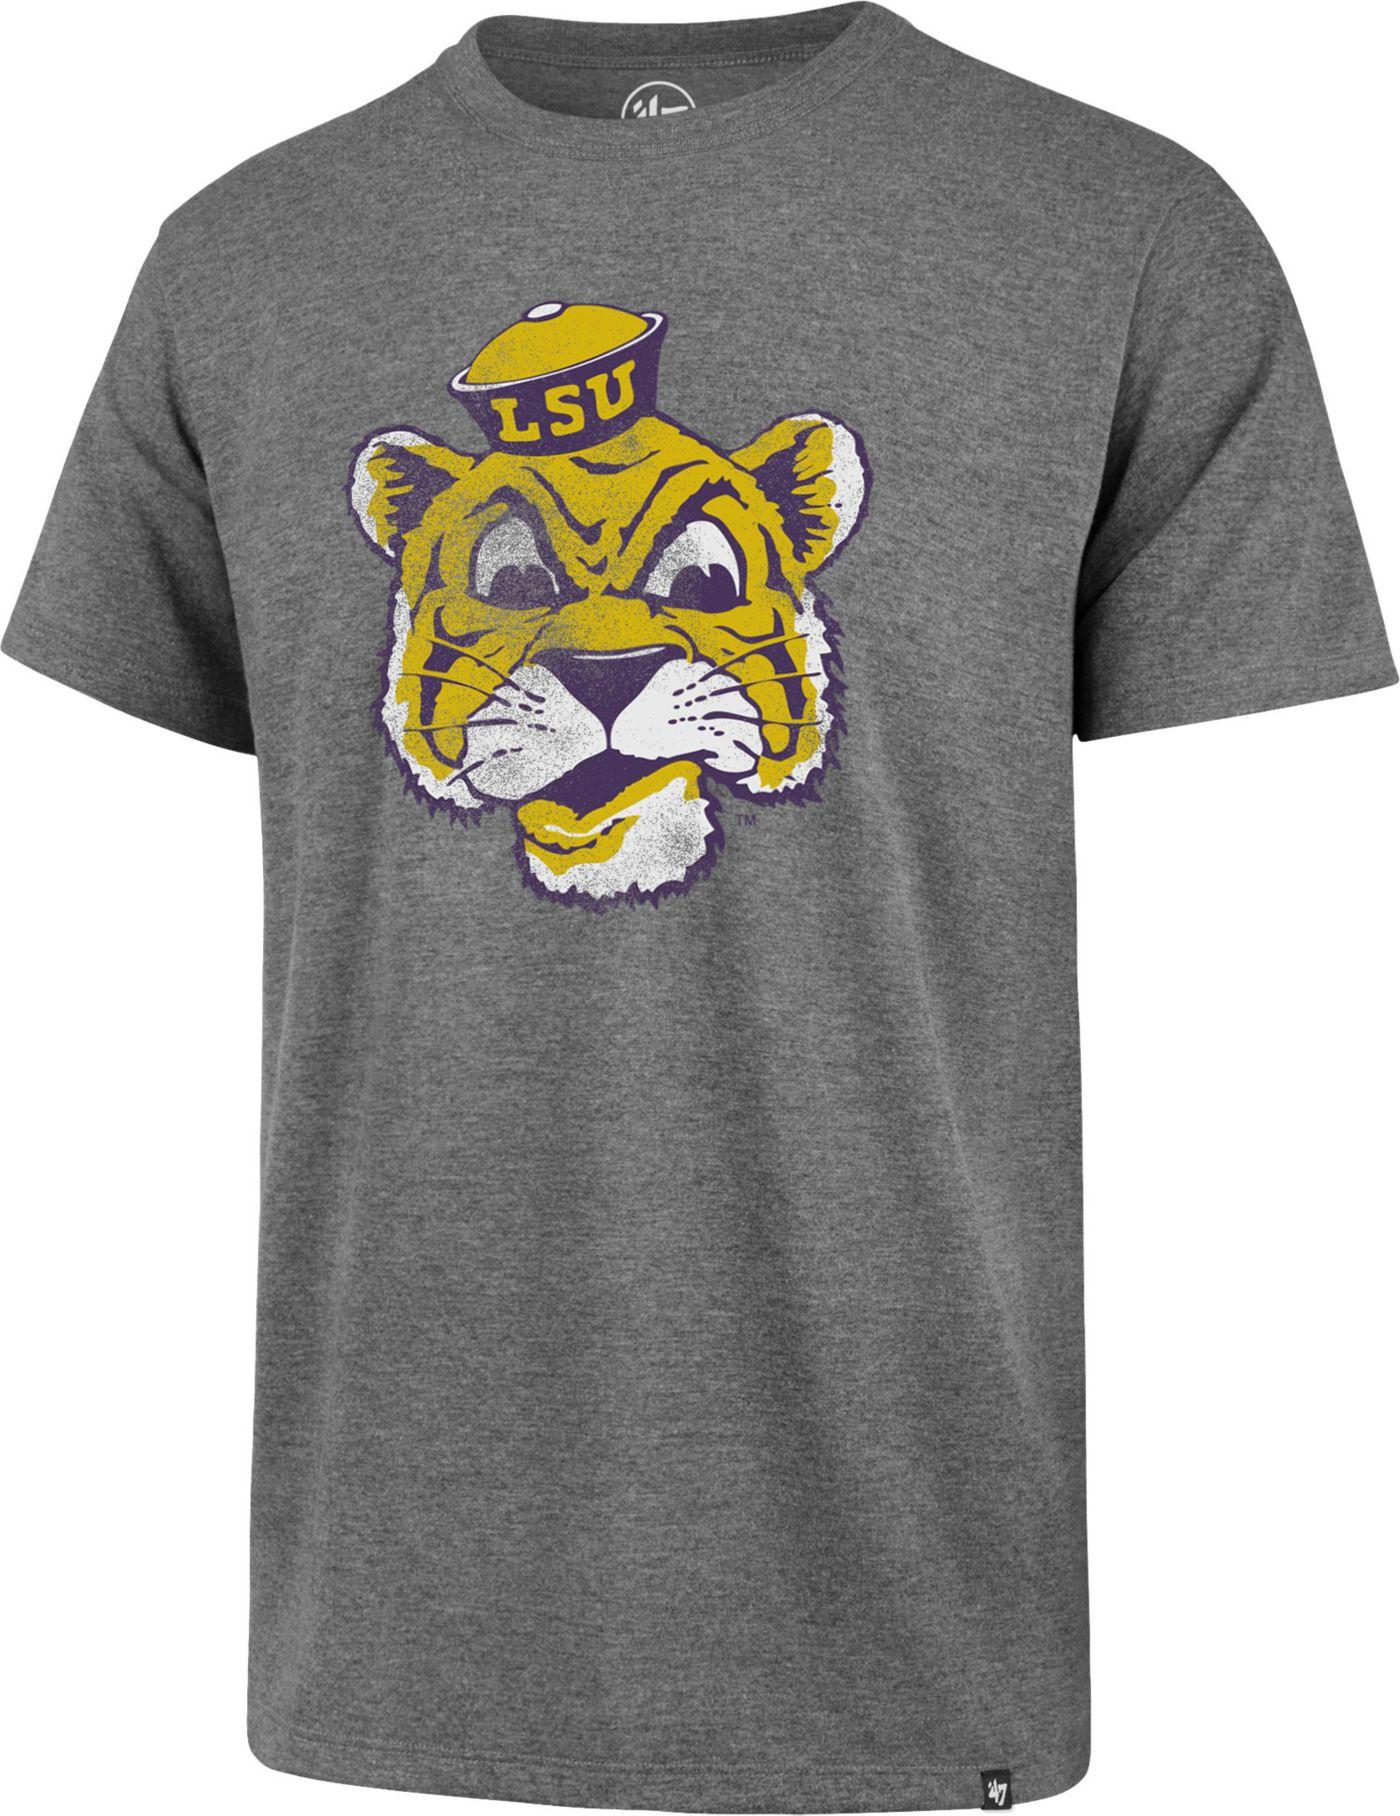 '47 Men's LSU Tigers Grey Imprint Club T-Shirt